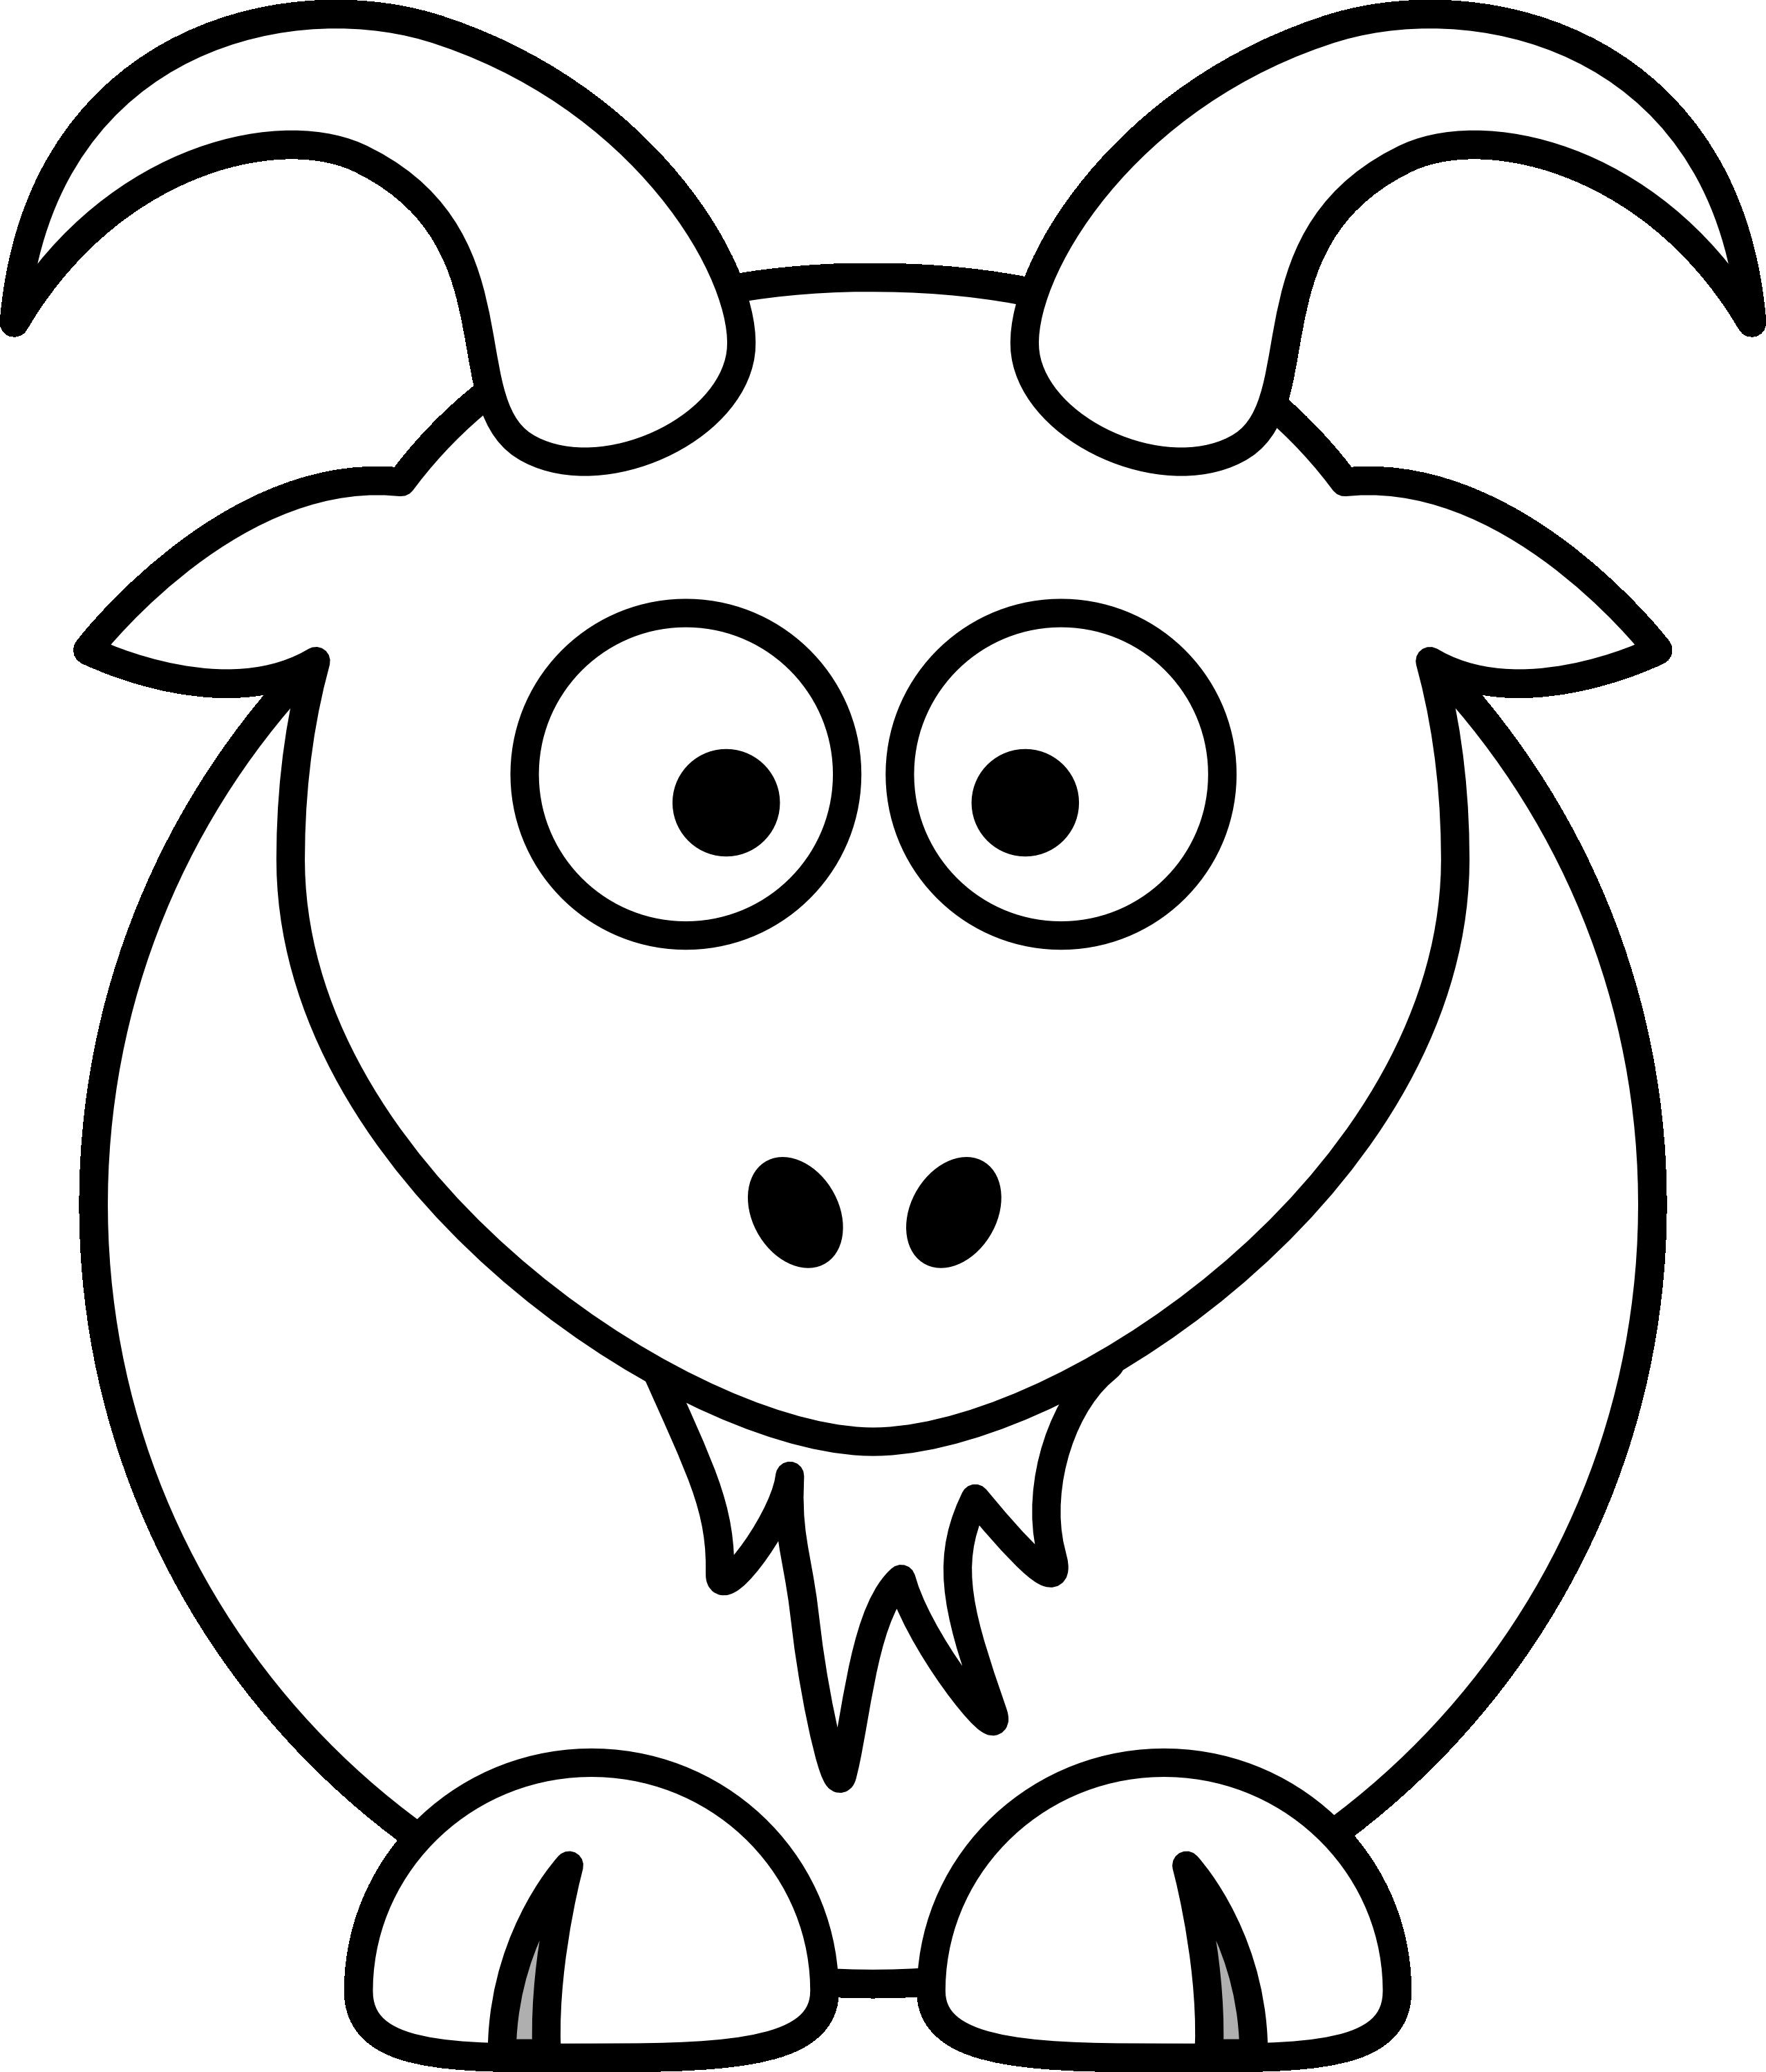 Free clipart black and white farm animals picture royalty free download Farm animals black and white clipart clipart images gallery for free ... picture royalty free download